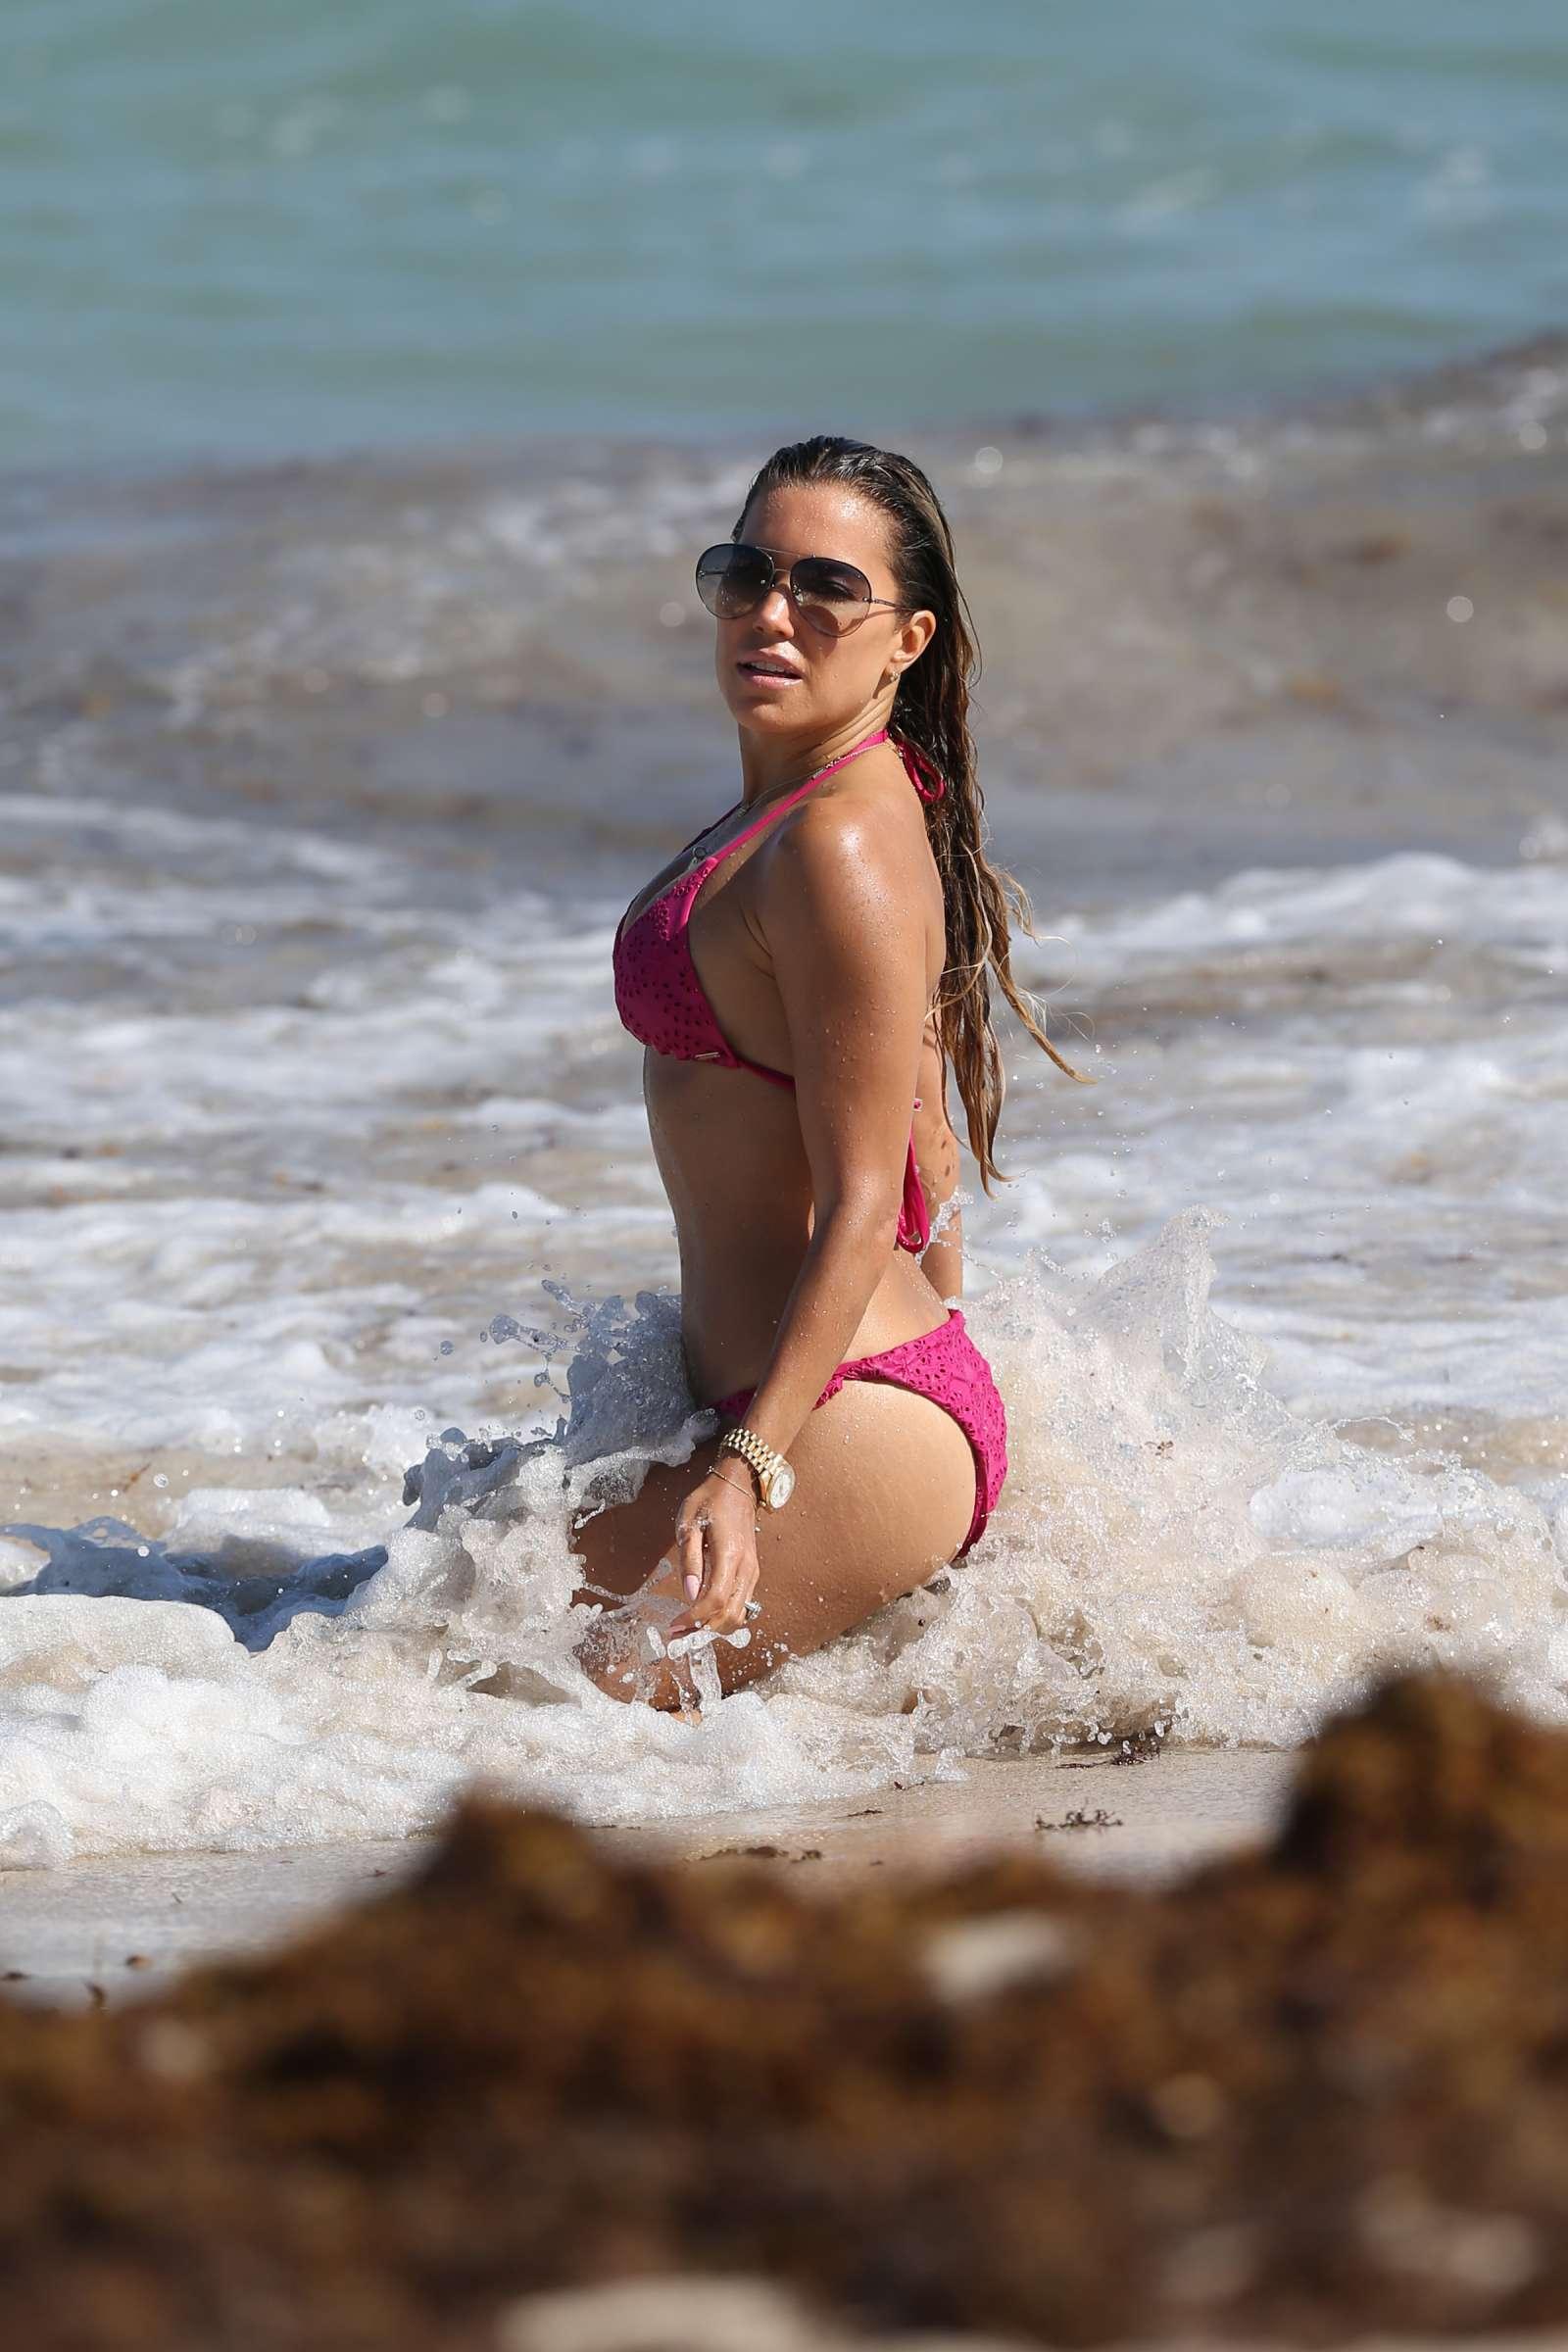 Sylvie Meis 2018 : Sylvie Meis in Pink Bikini 2018 -15